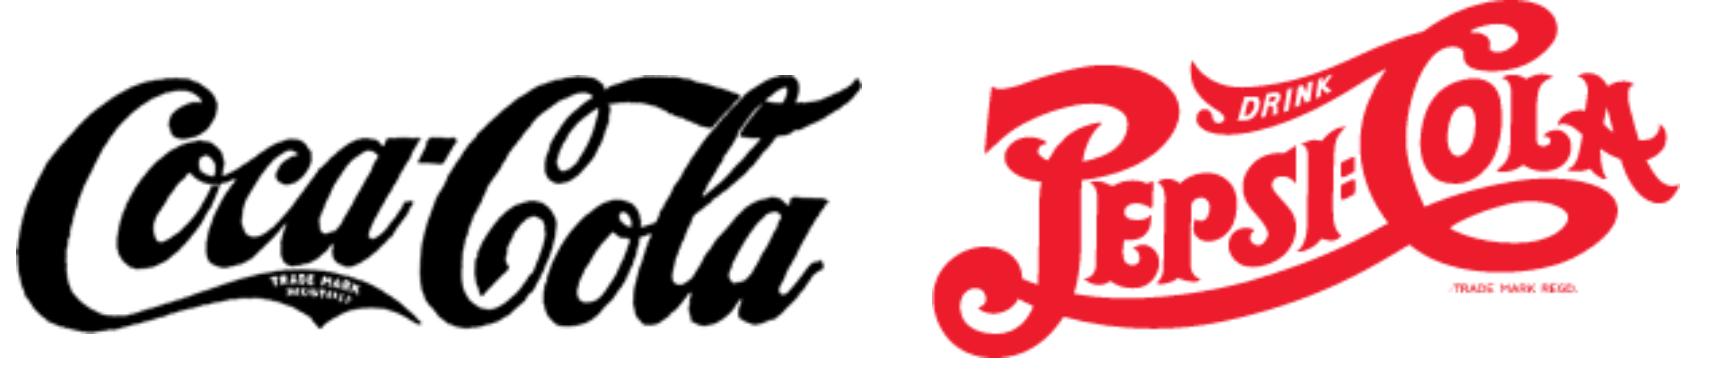 Coca-cola and Pepsi logos in 1905-1906